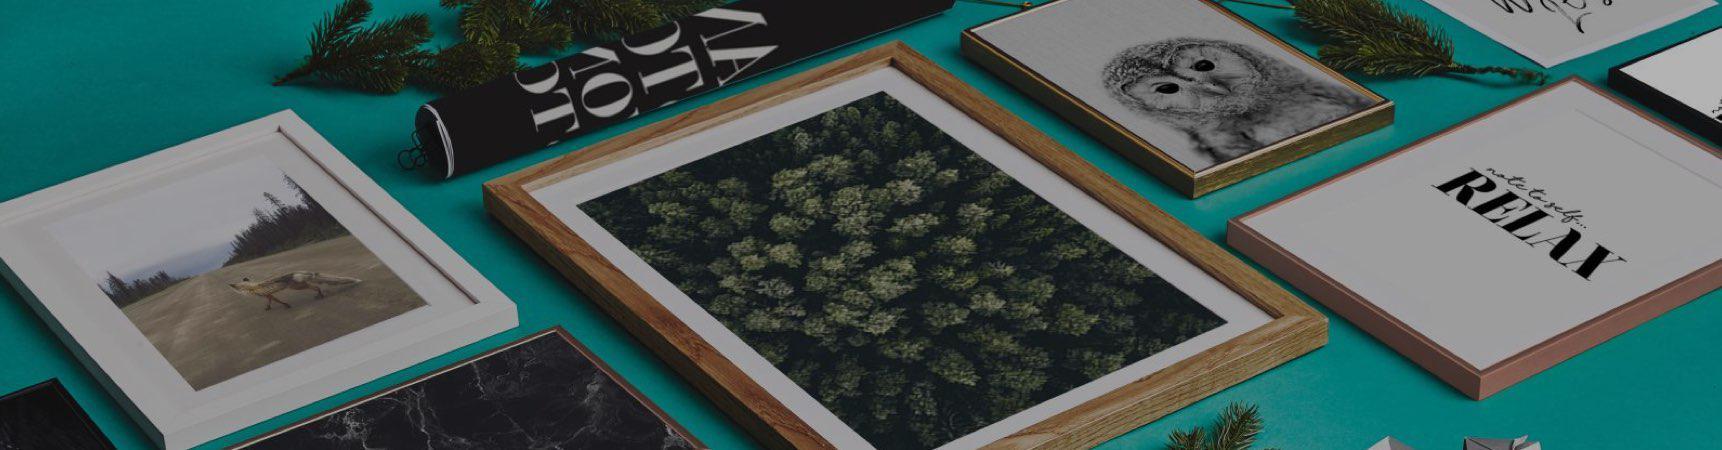 geschenke f r kollegen geschenkideen f r chef mitarbeiter juniqe. Black Bedroom Furniture Sets. Home Design Ideas